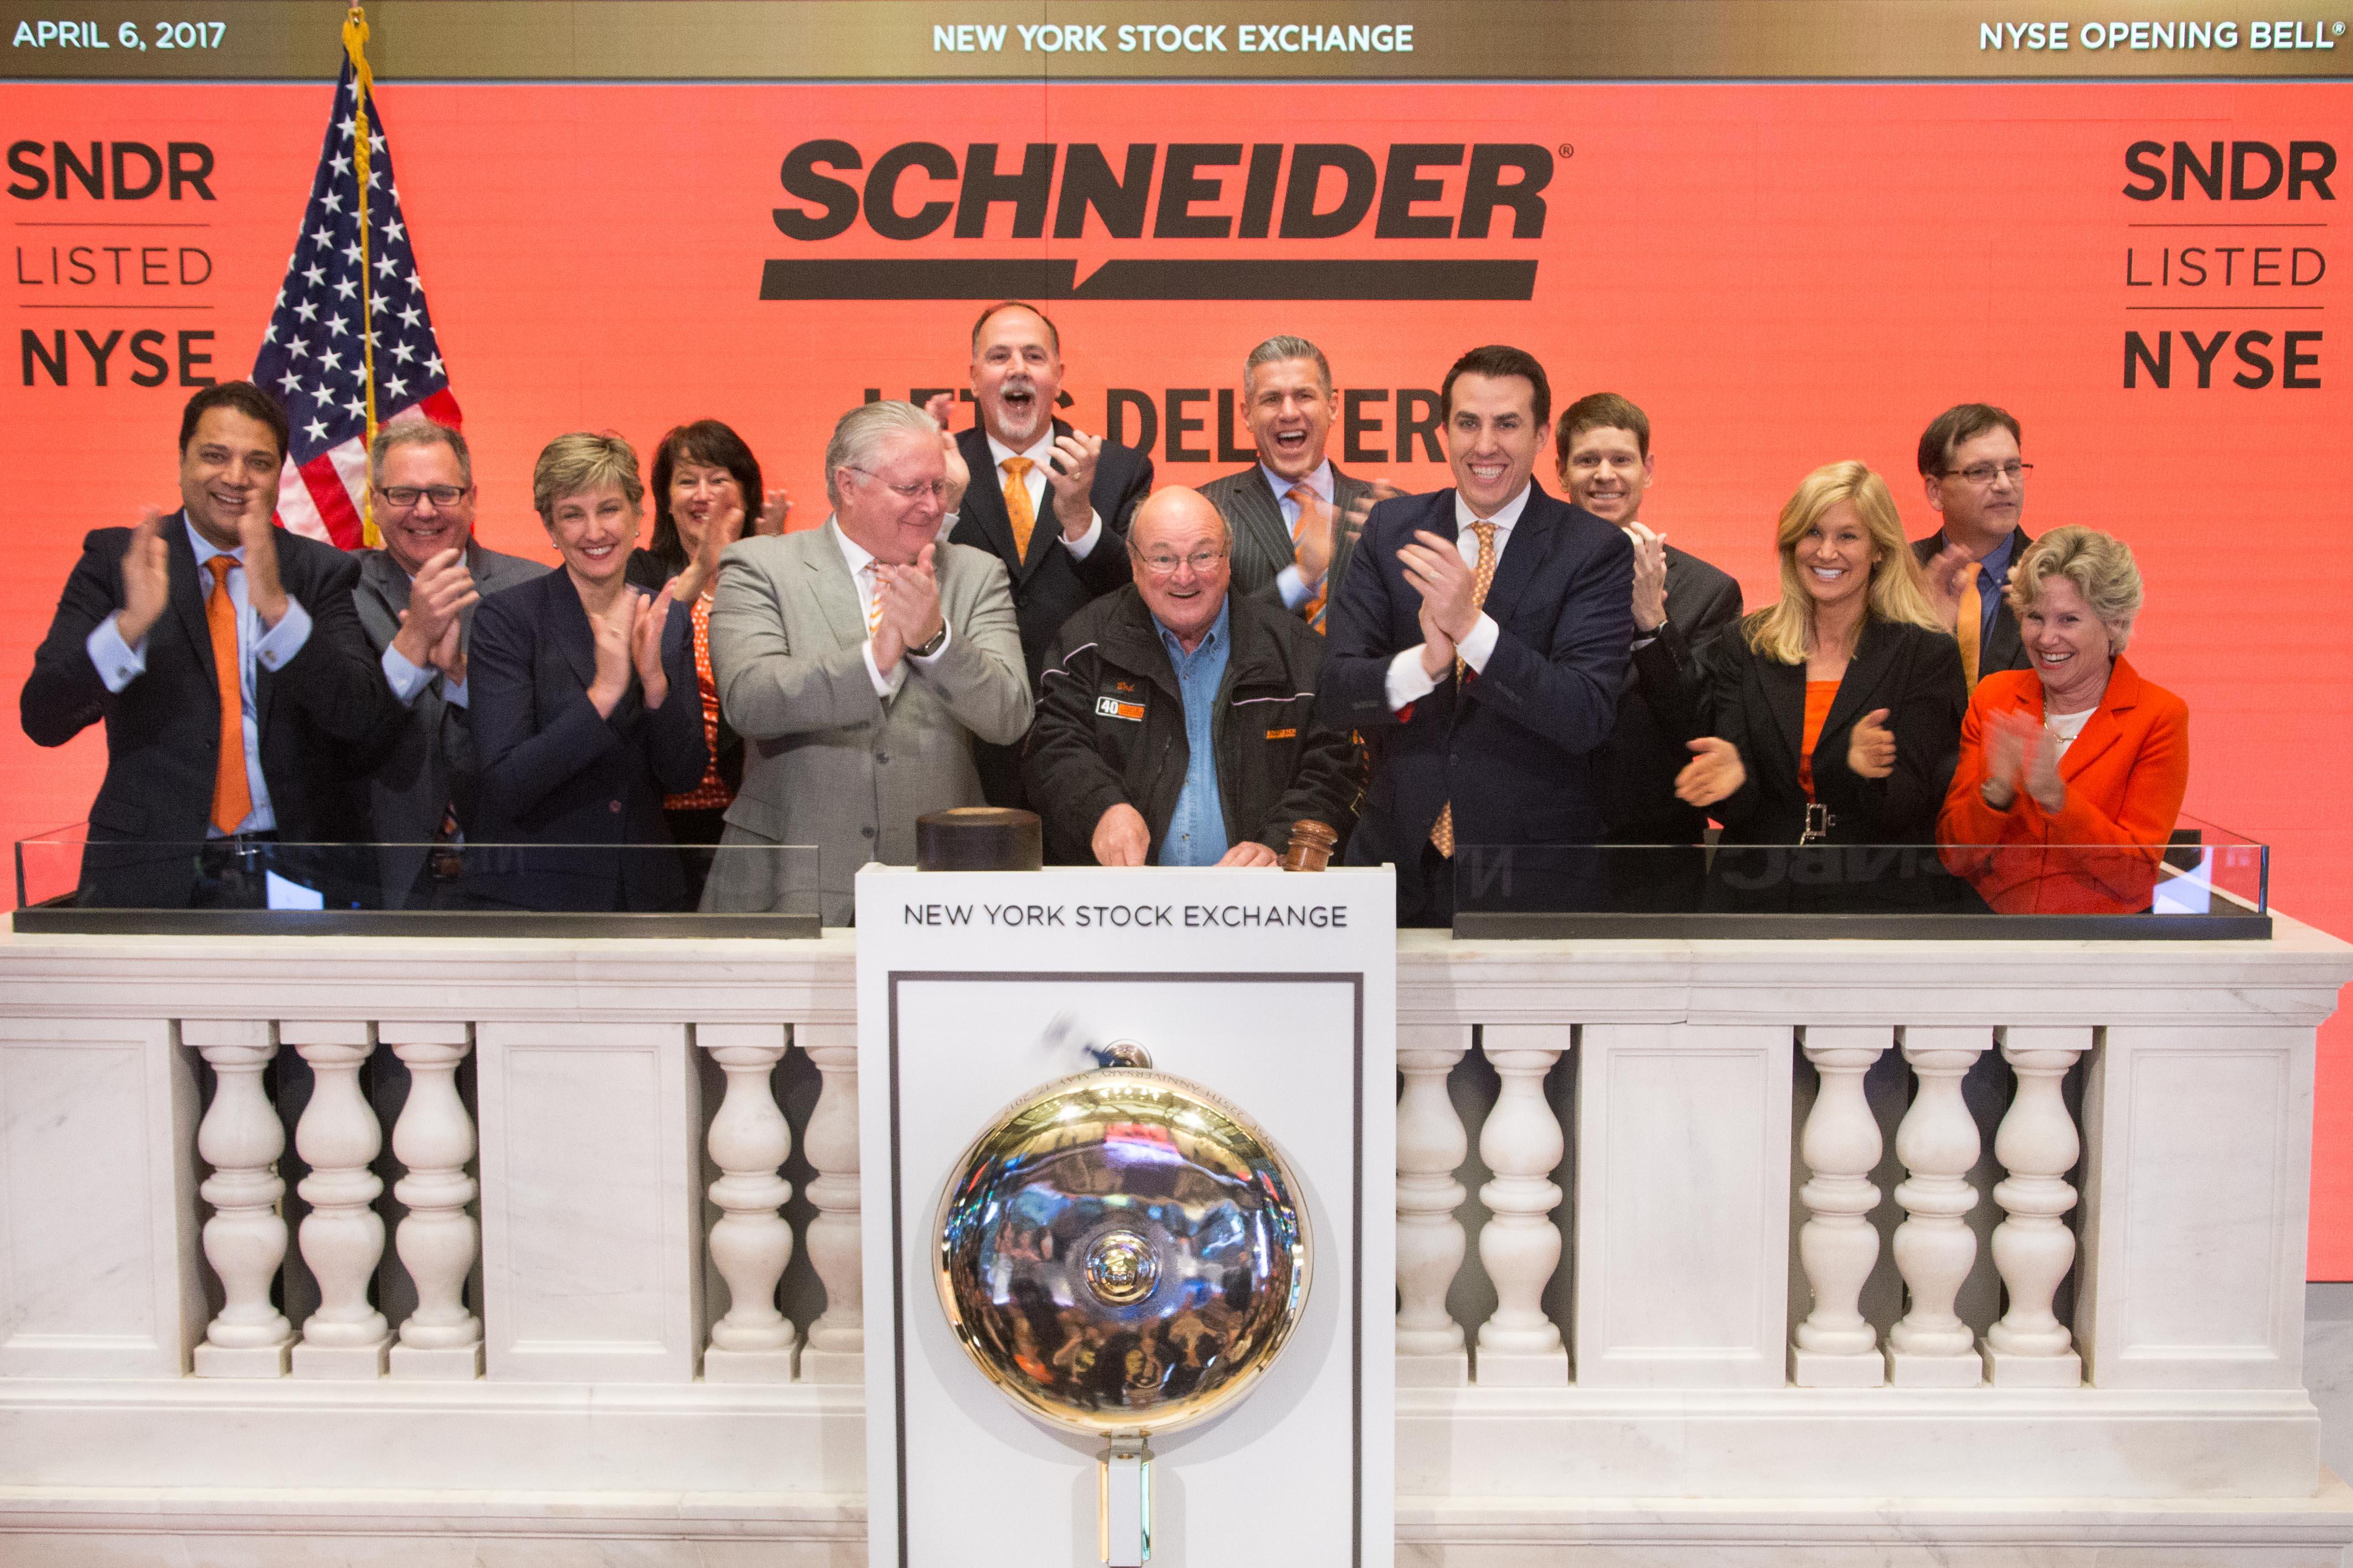 Schneider Driver Ringing Opening Bell